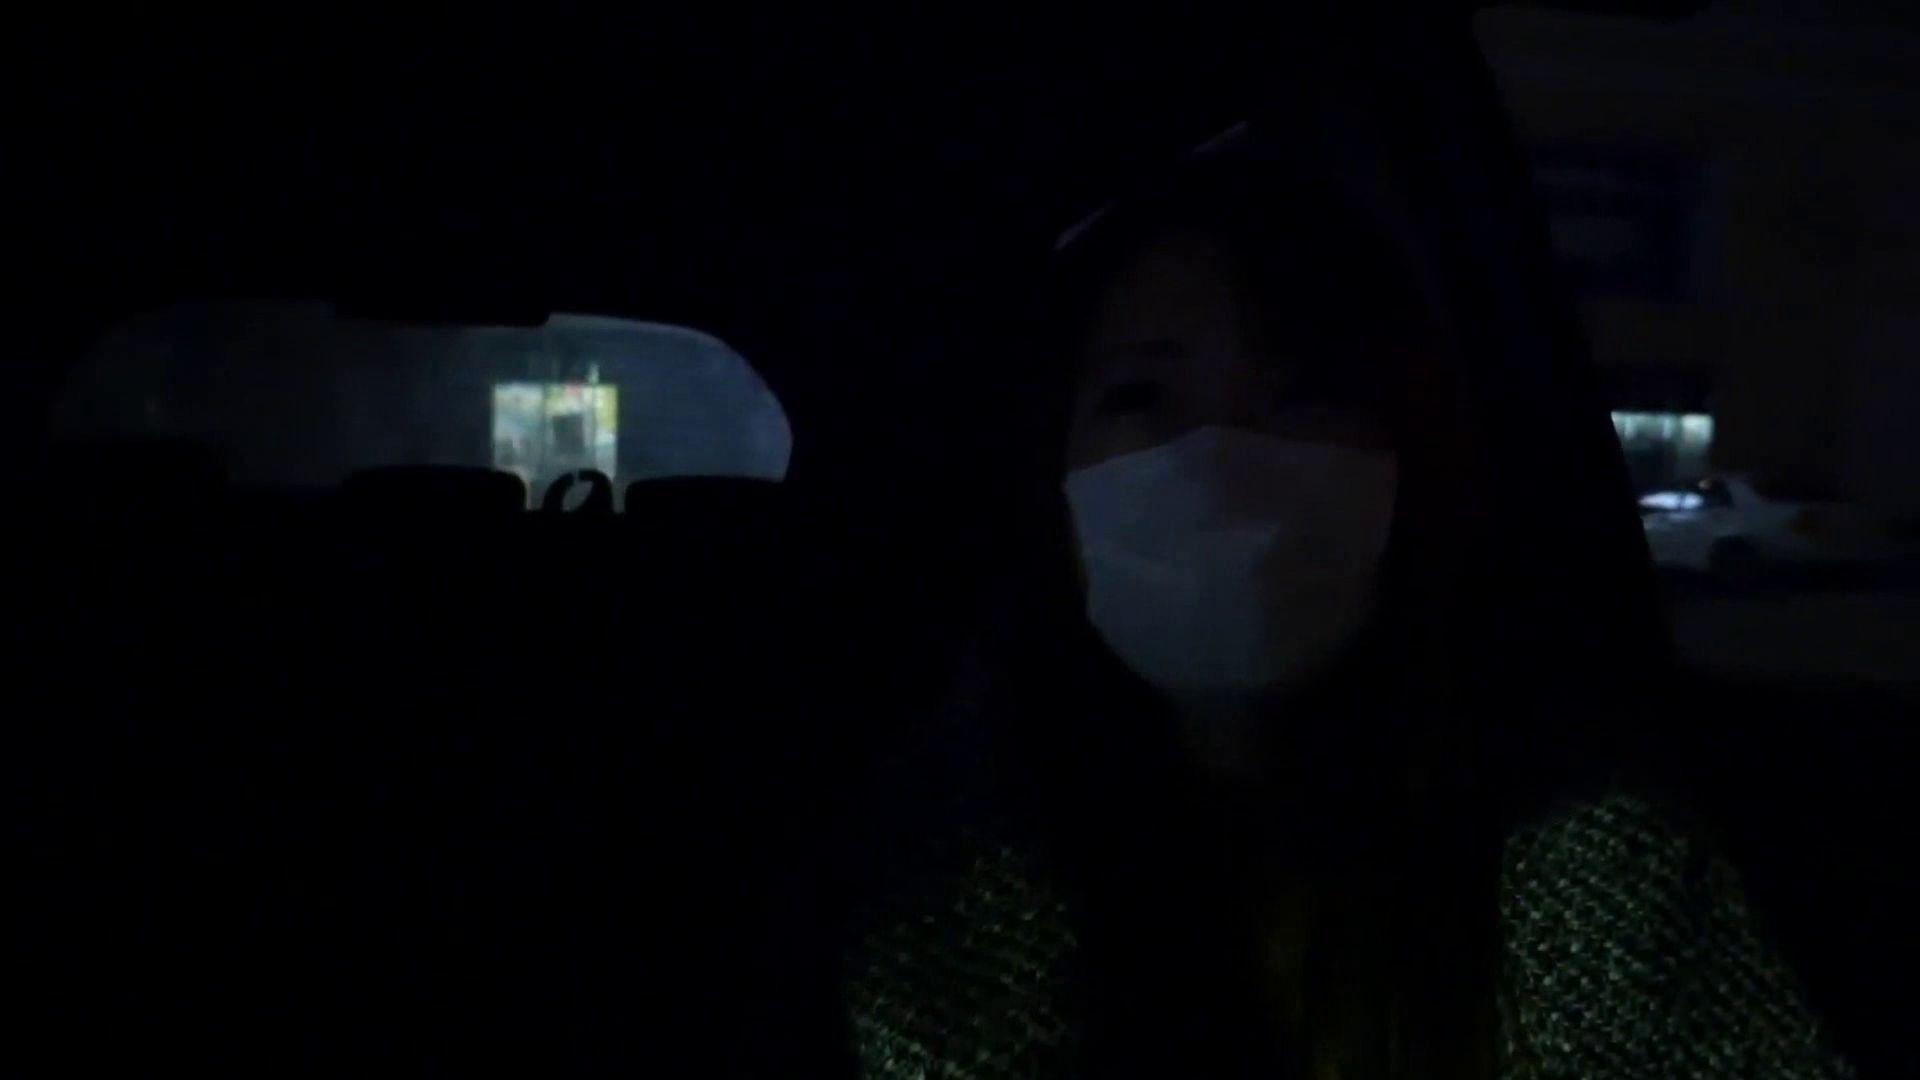 S級厳選美女ビッチガールVol.40 前編 美女  86pic 2